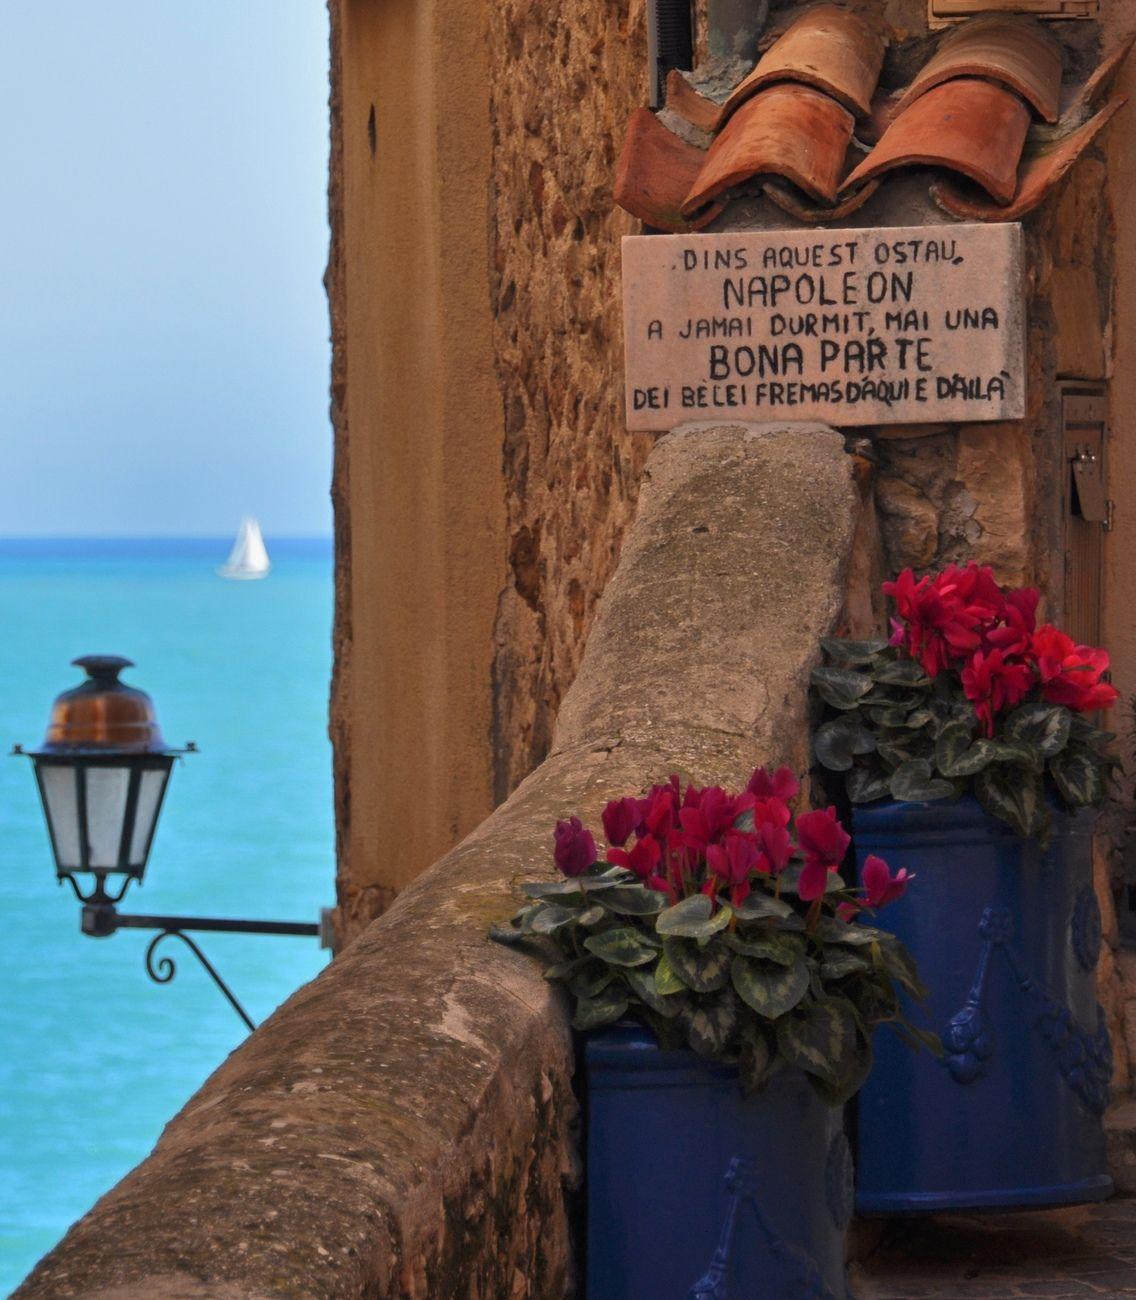 Napoleon snark in Antibes